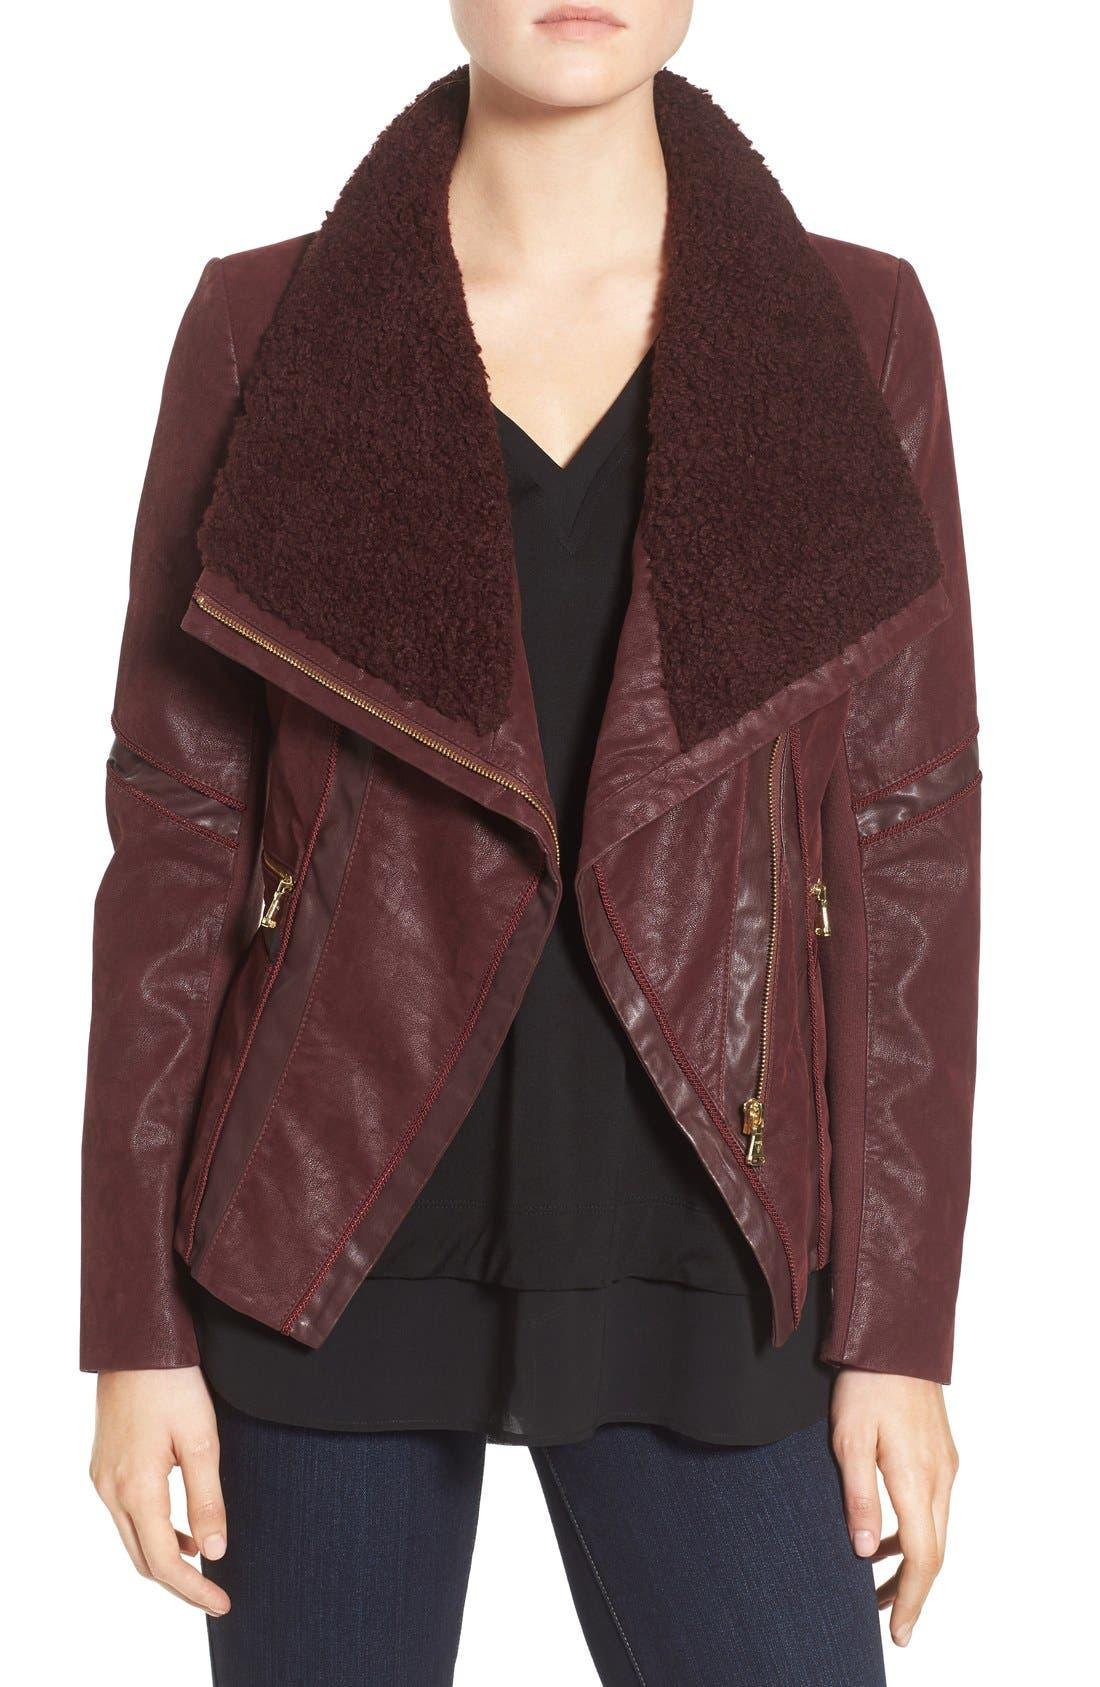 Main Image - GUESS Faux Leather Moto Jacket with Faux Fur Trim